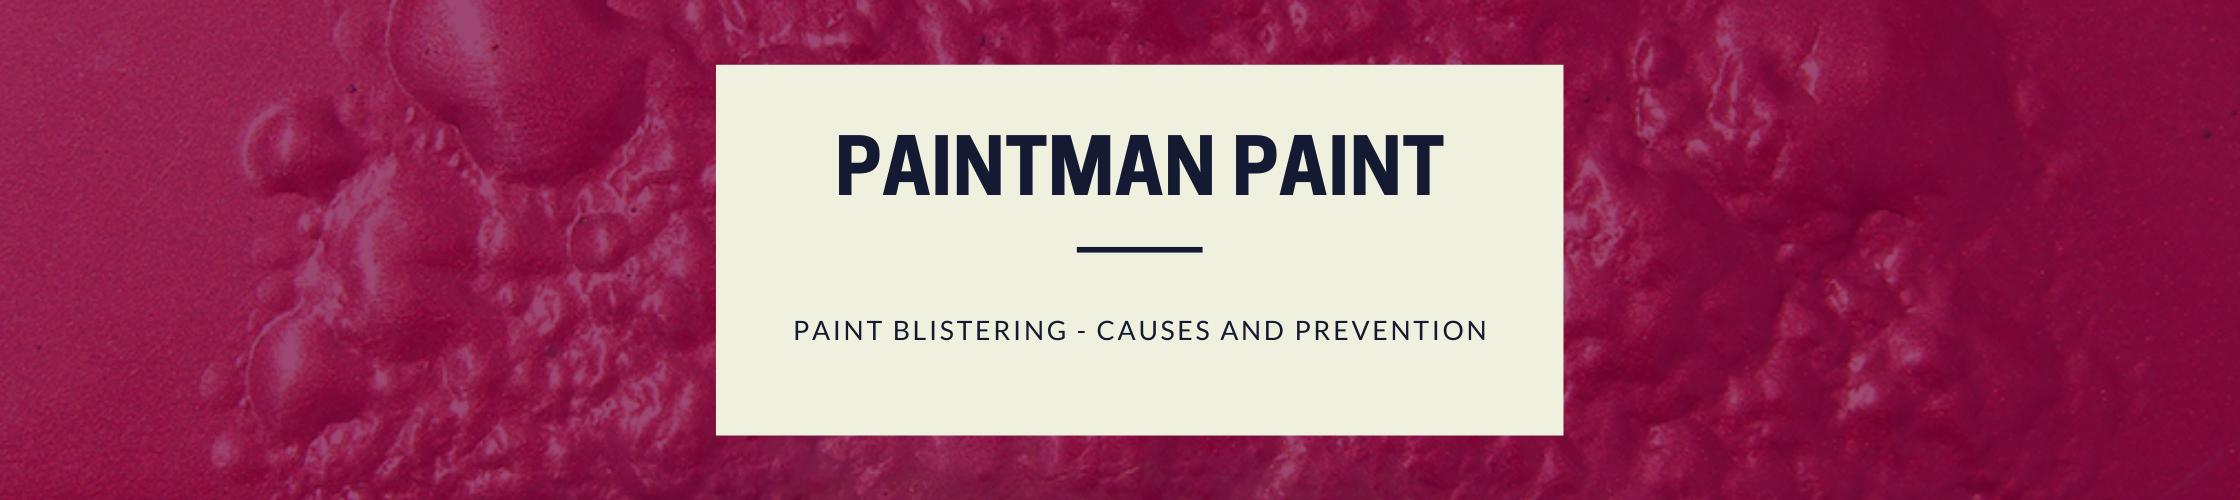 paint blistering